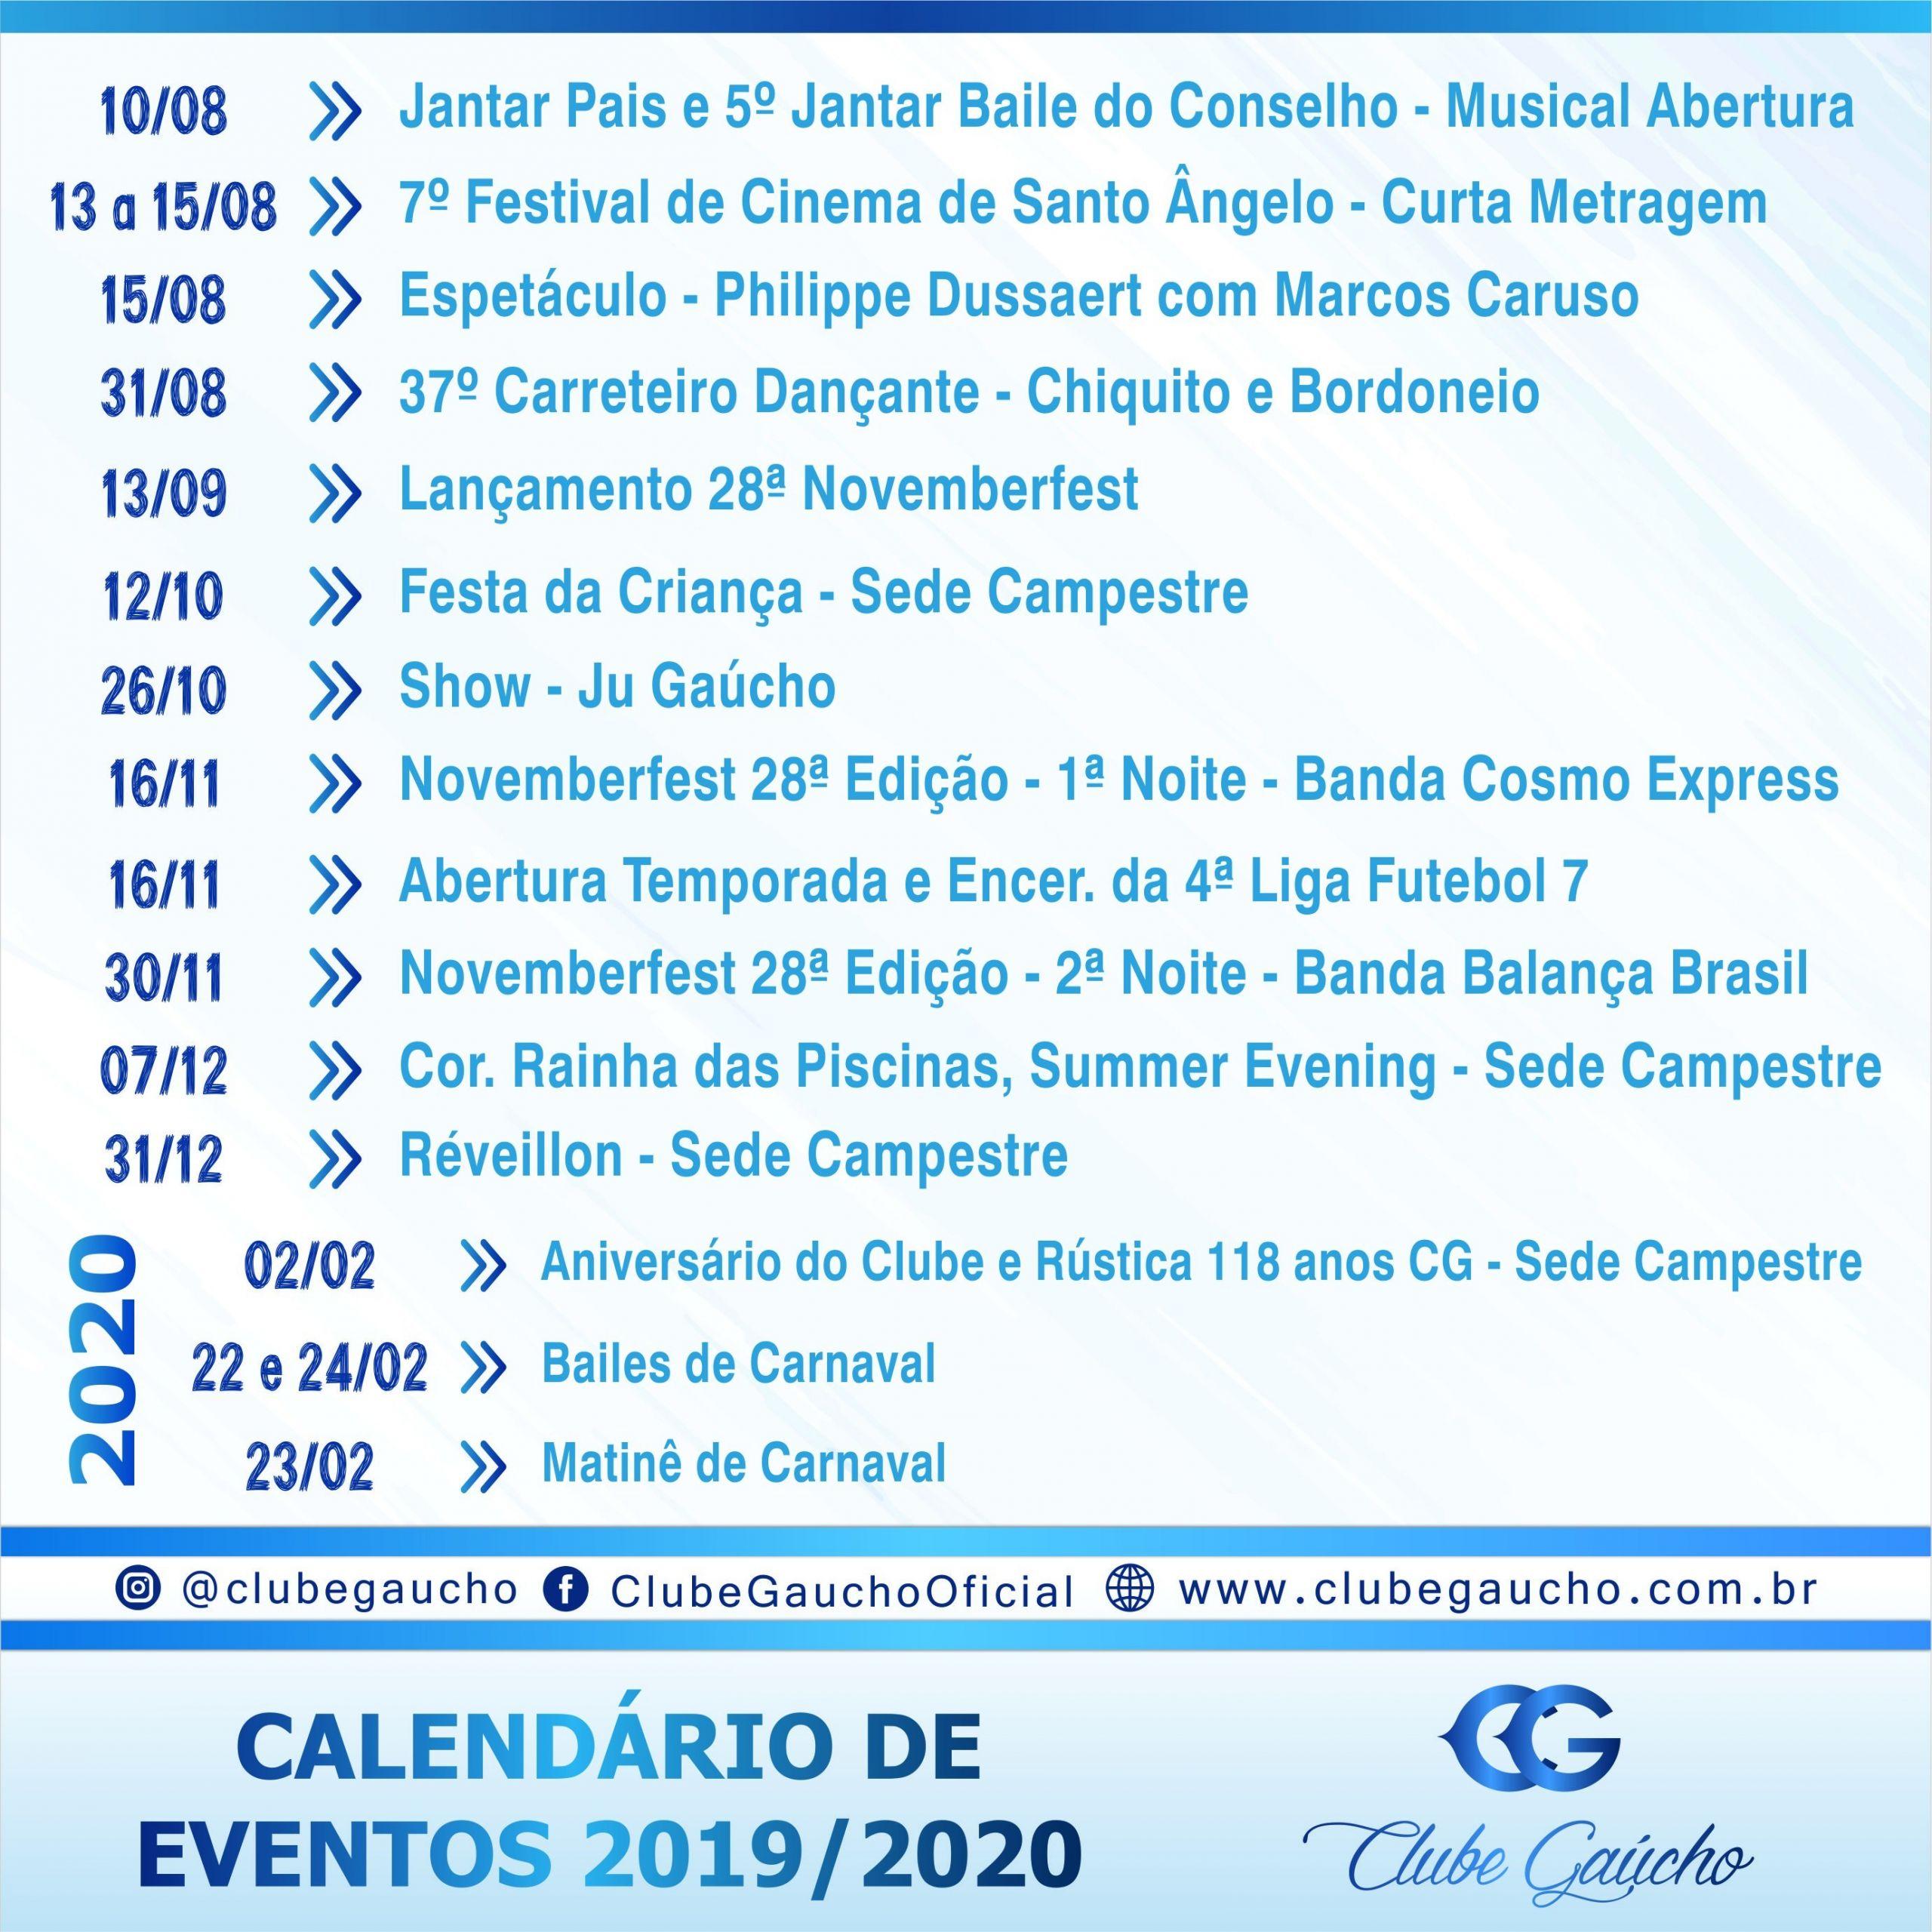 calendario 2020 oficial mas recientemente liberado calendario 2019 br arparis of calendario 2020 oficial